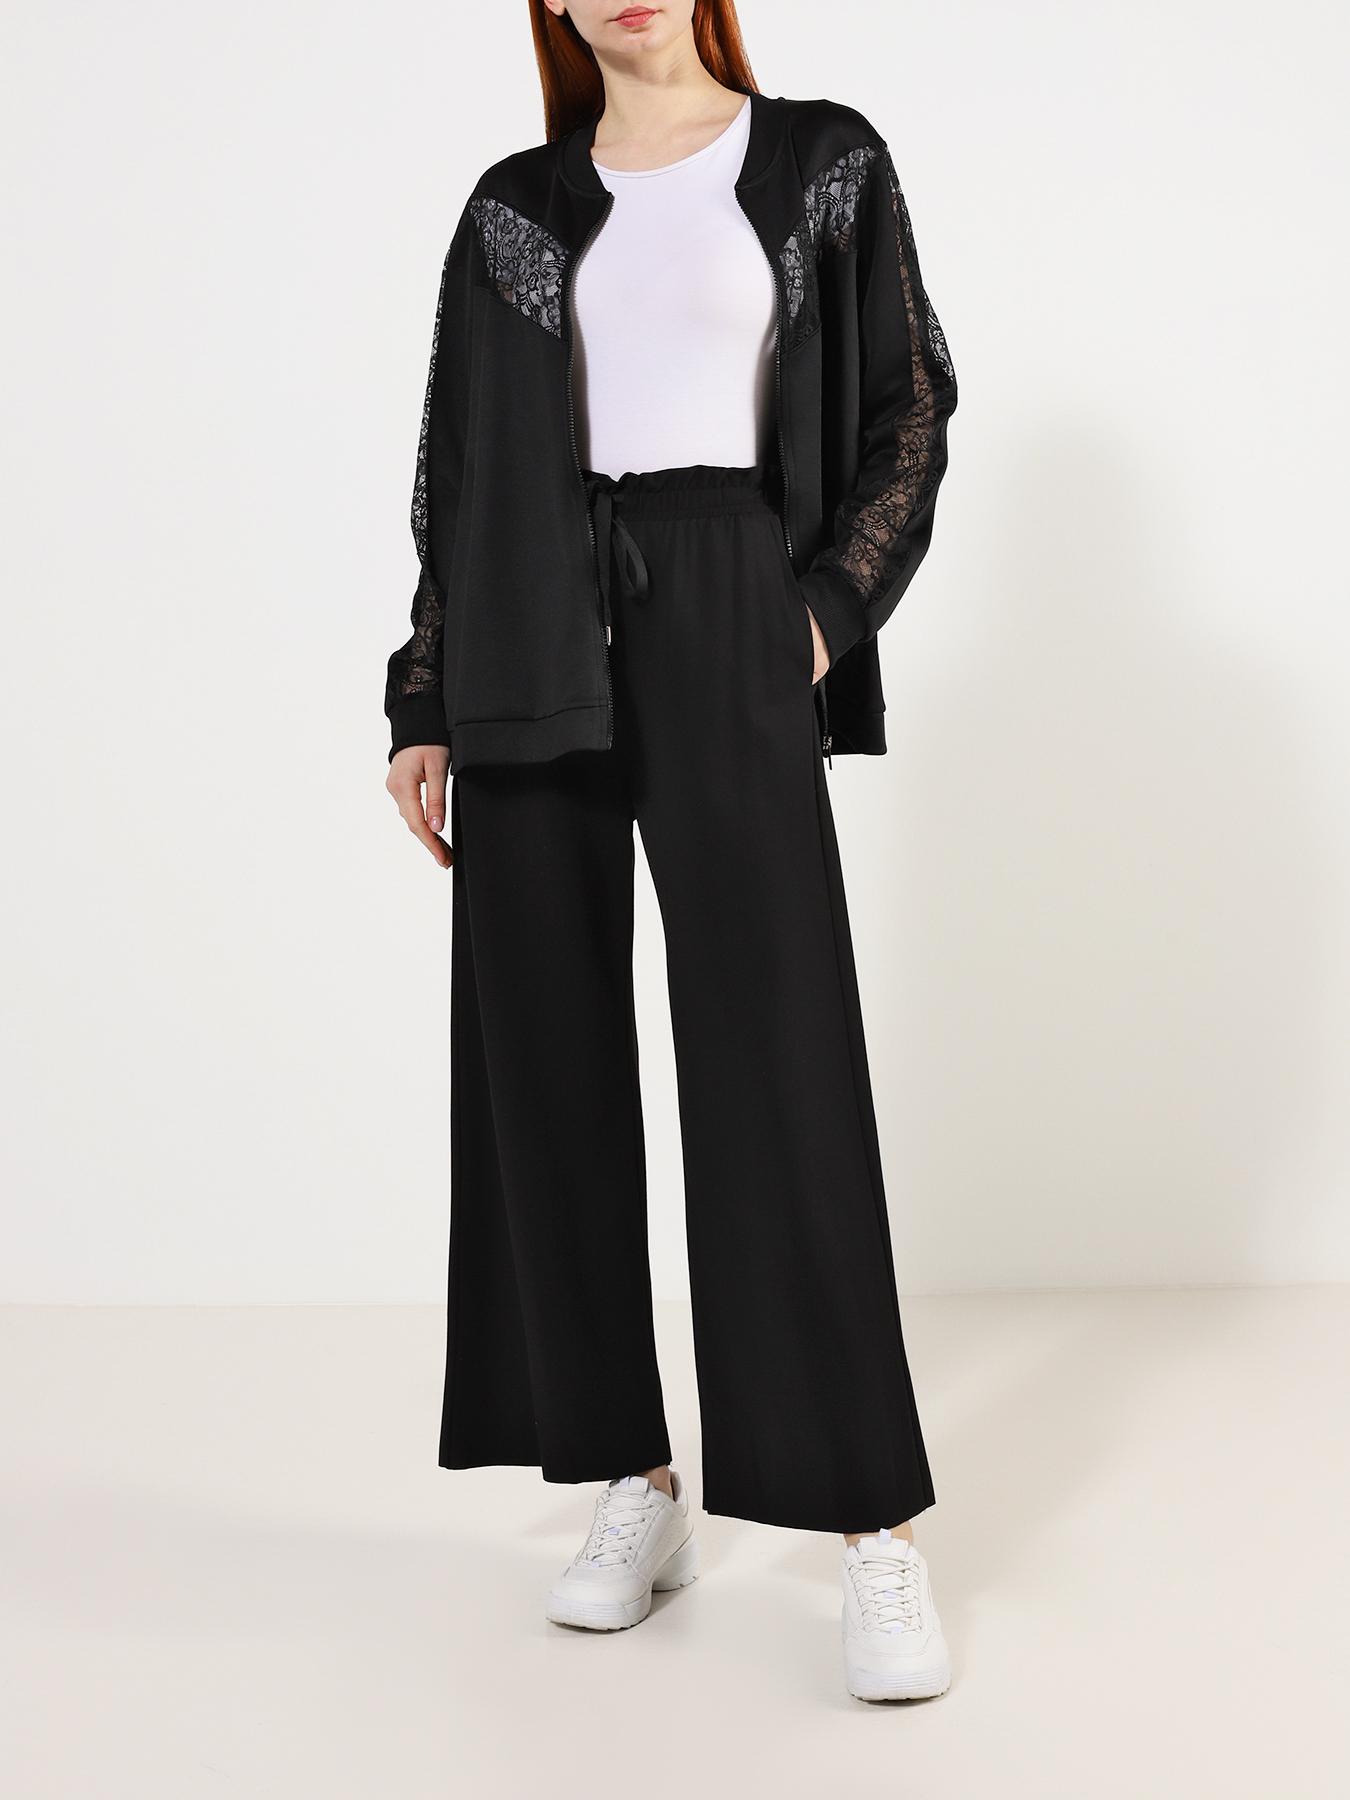 Куртка Persona by Marina Rinaldi Бомбер plus size